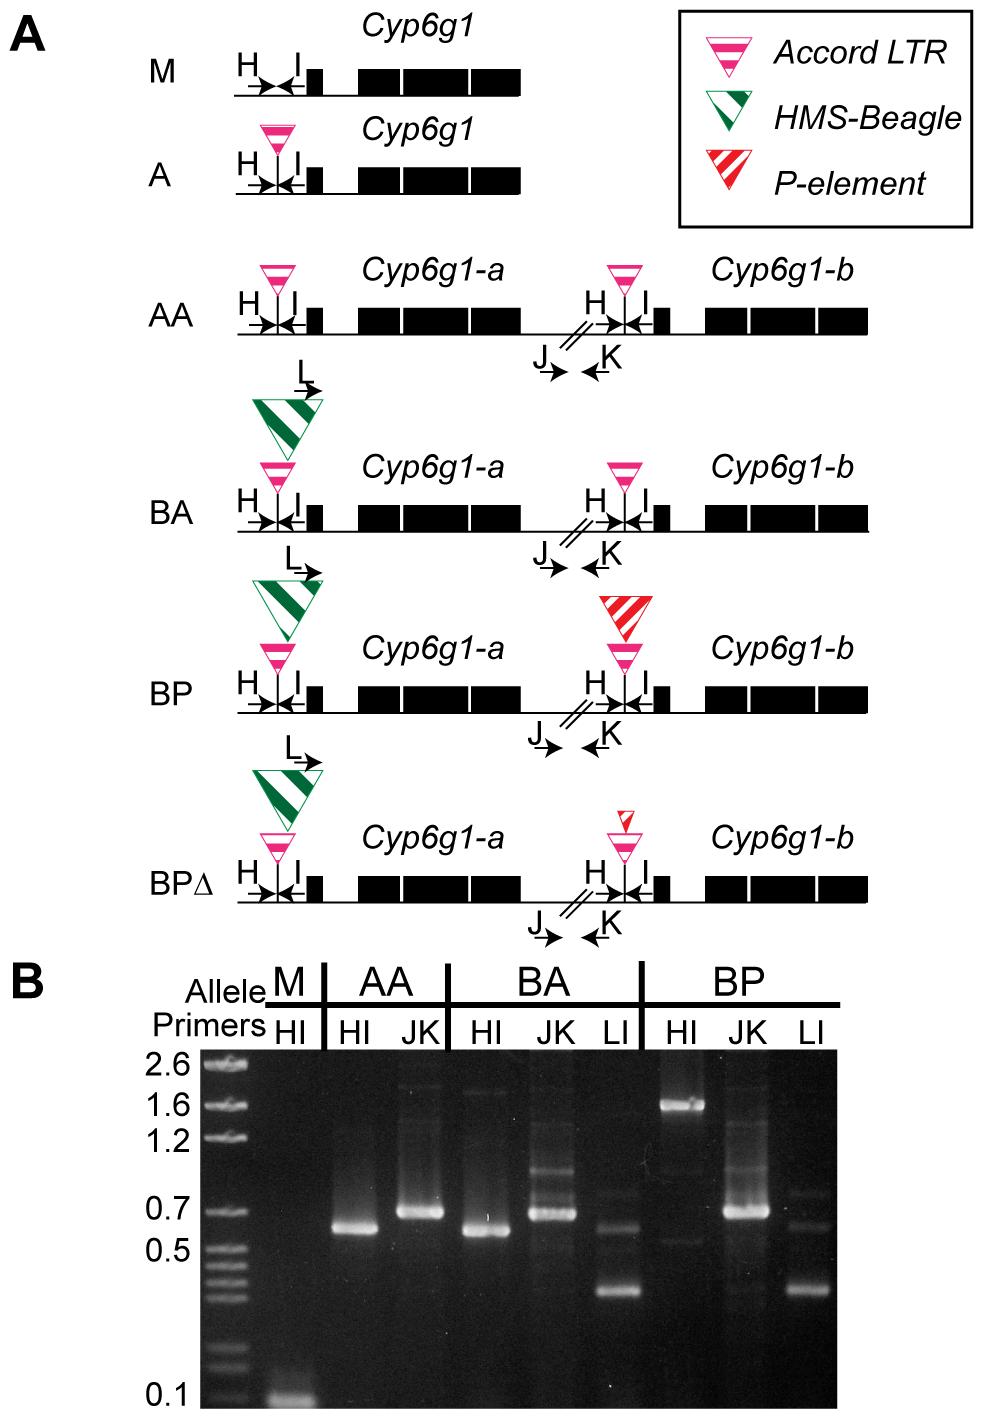 The six alleles of <i>Cyp6g1</i>.